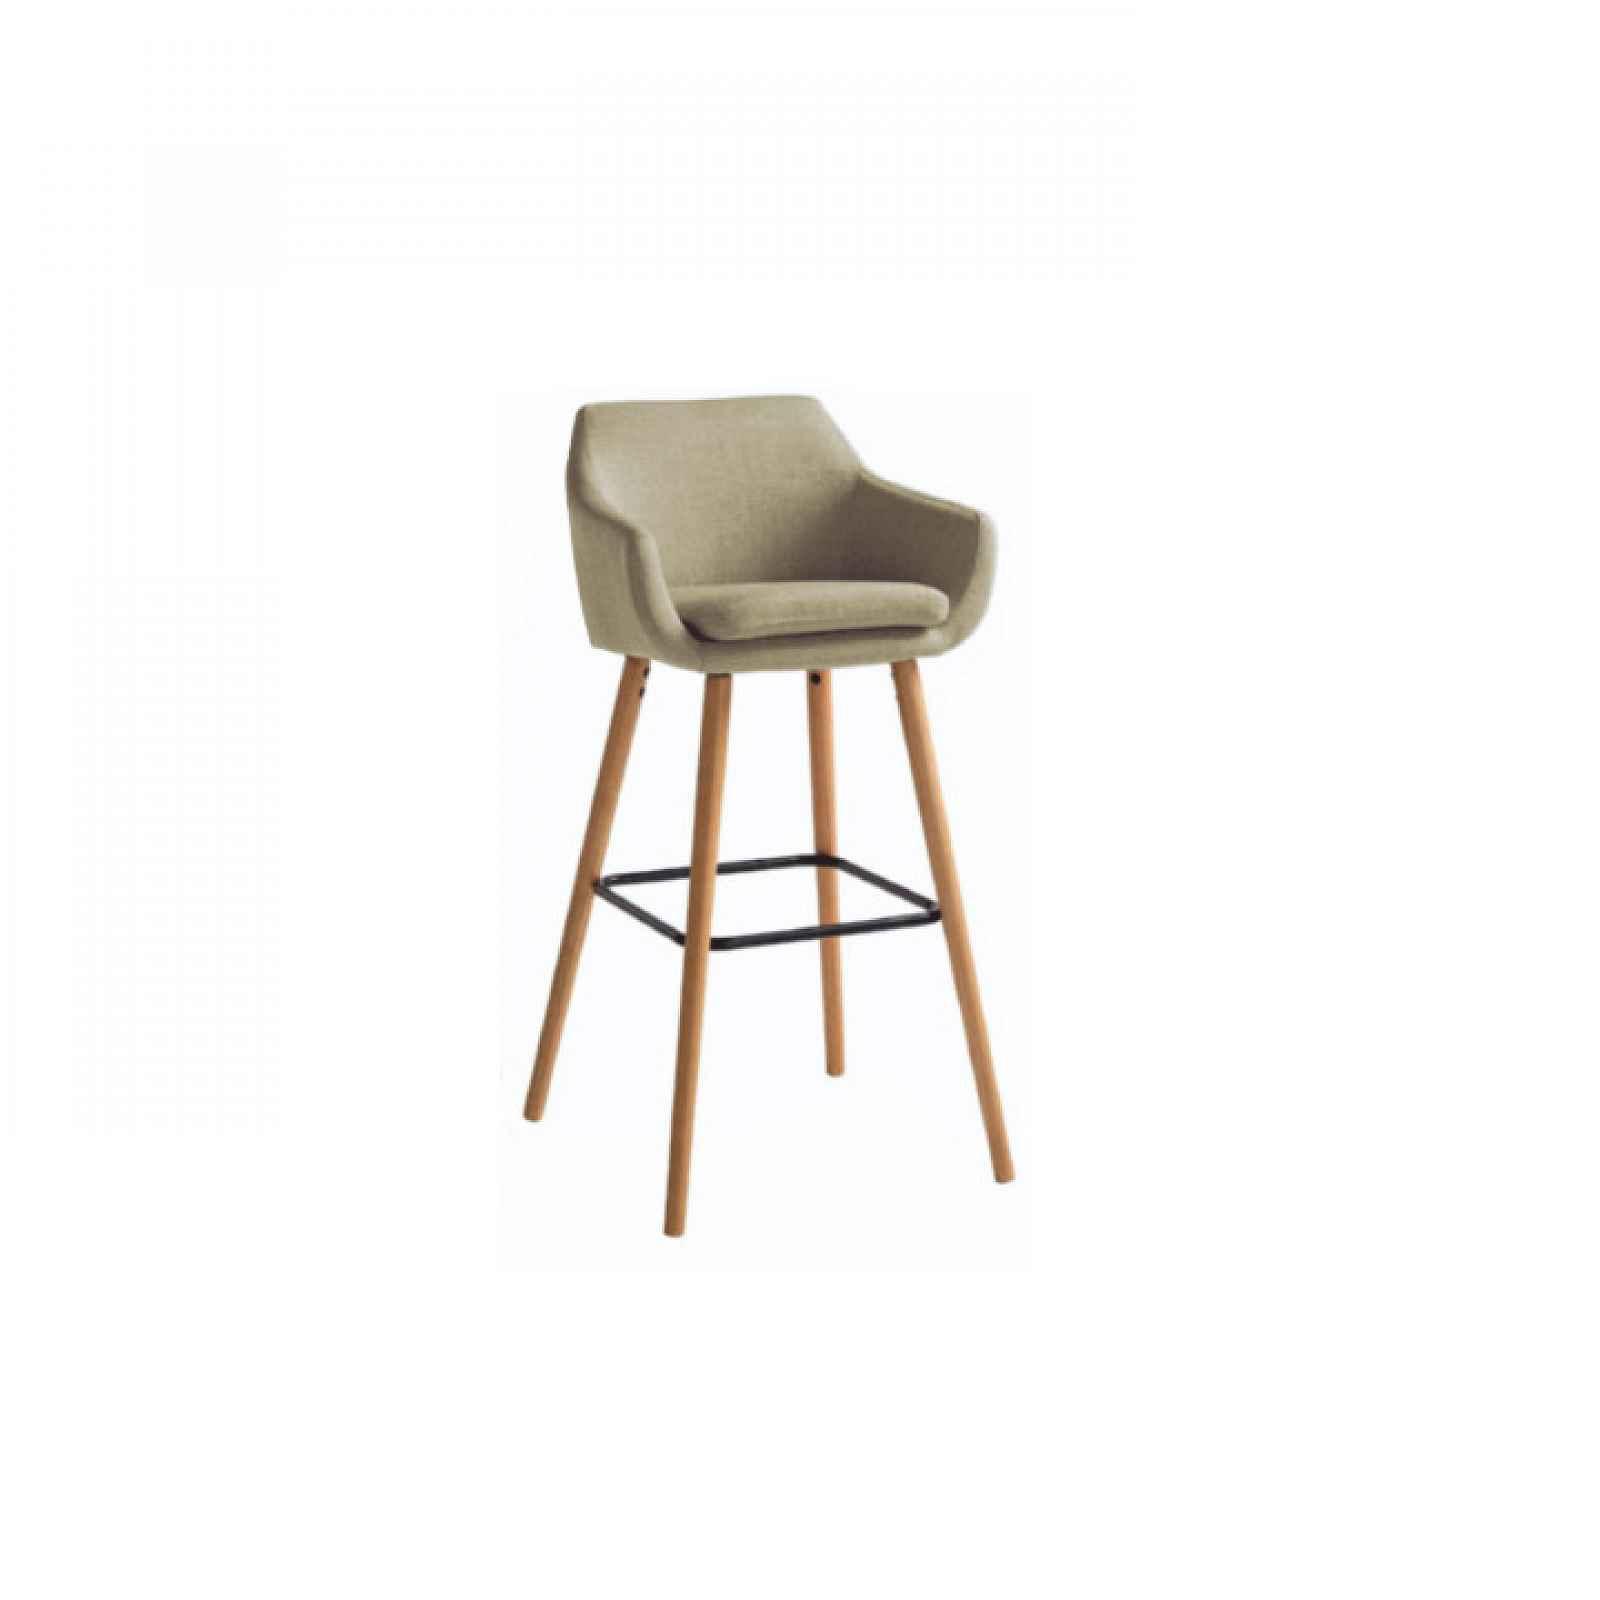 Barová židle, šedohnědá látka / černá, Tahira 0000204525 Tempo Kondela Béžová